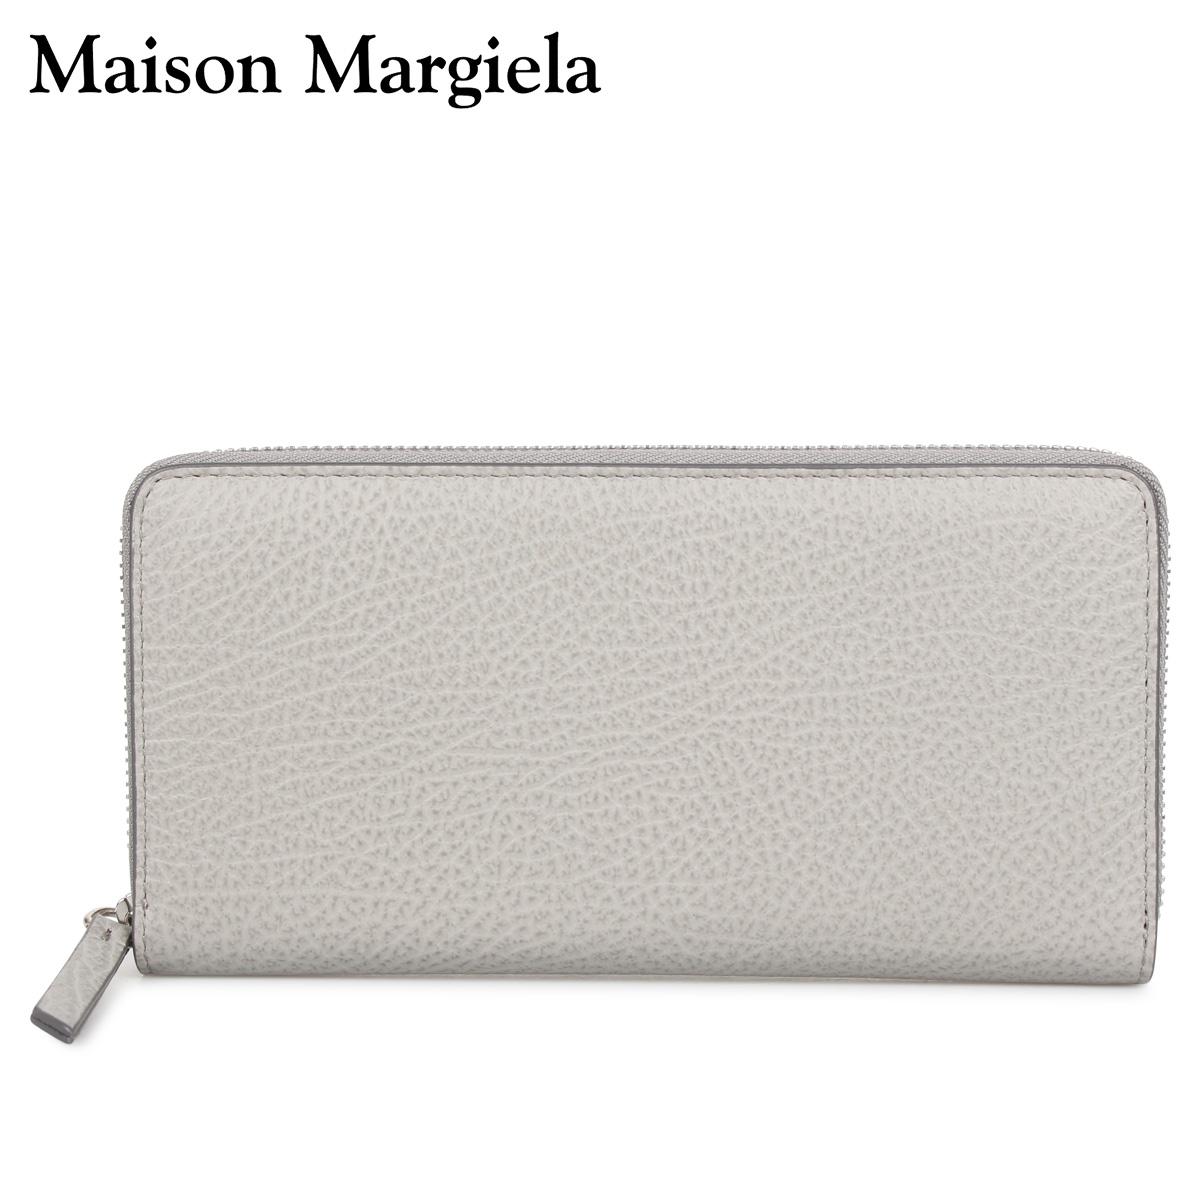 MAISON MARGIELA メゾンマルジェラ 財布 長財布 メンズ レディース LONG WALLET グレー S56UI0110 [3/12 新入荷]